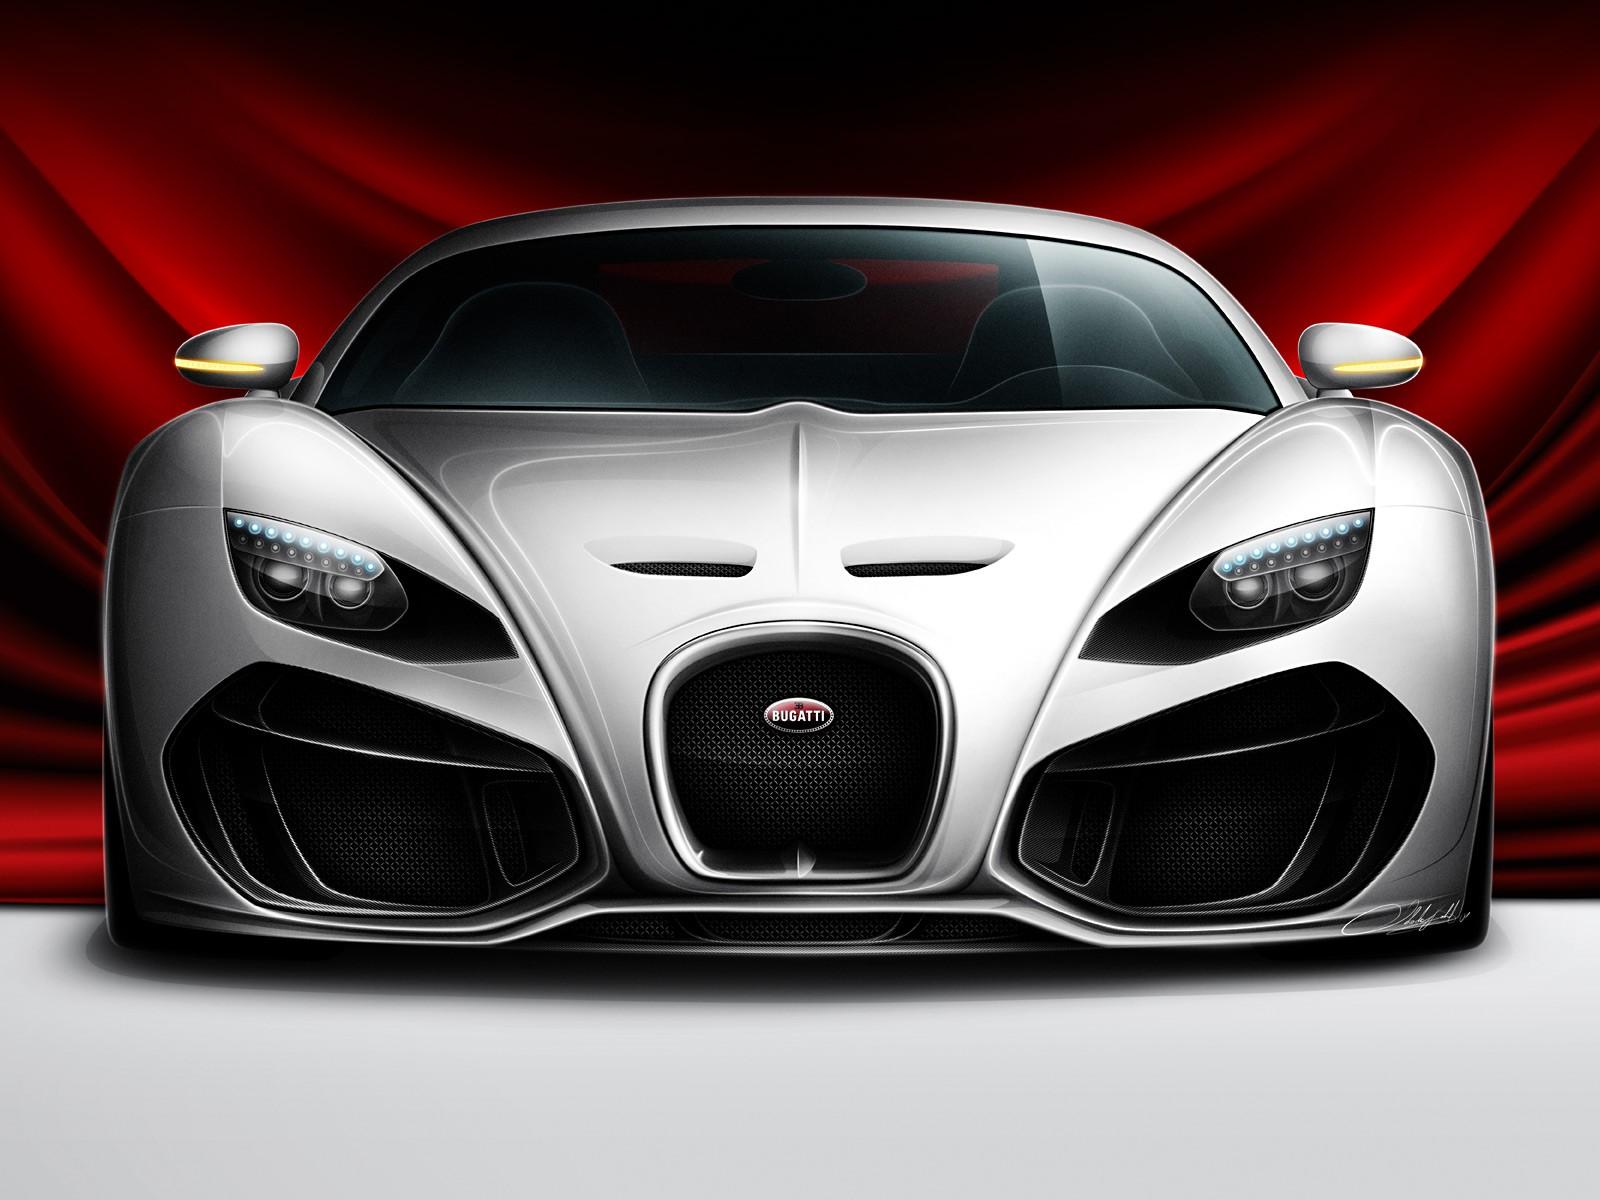 Free Cars HD Wallpapers: Bugatti Venom Concept Car HD Wall